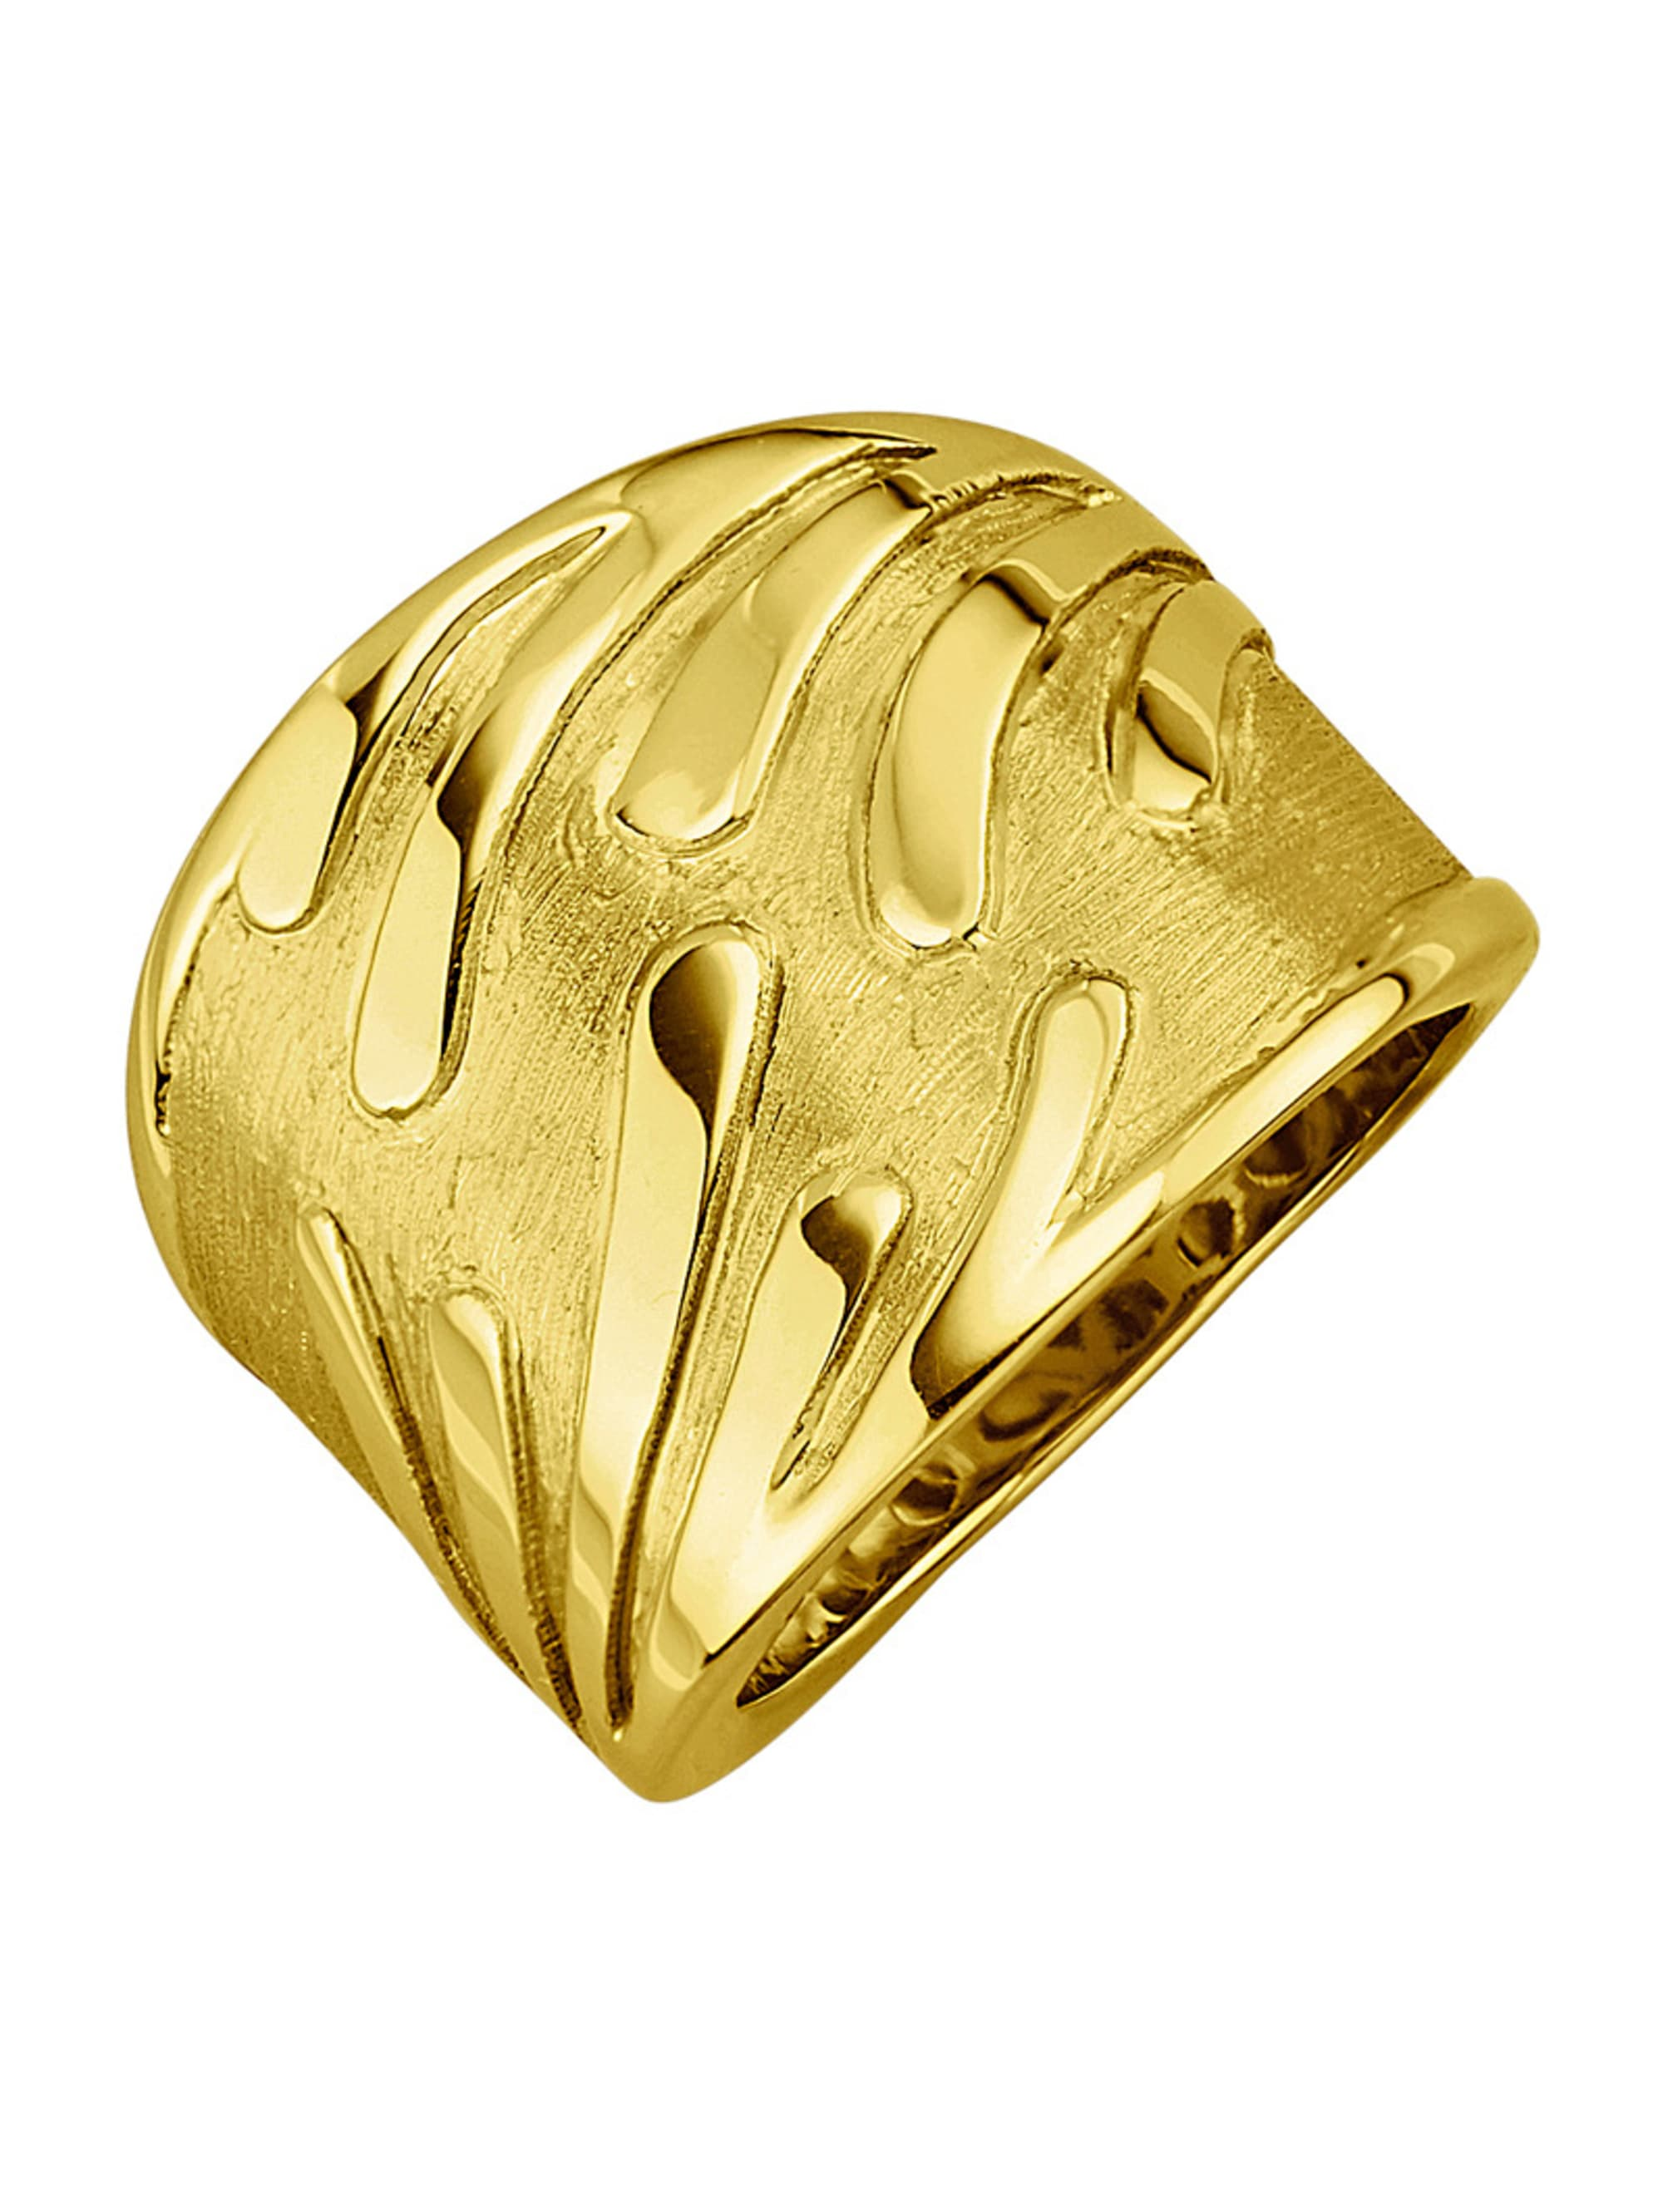 Diemer Gold Damenring in Gelbgold 585 2b1z9